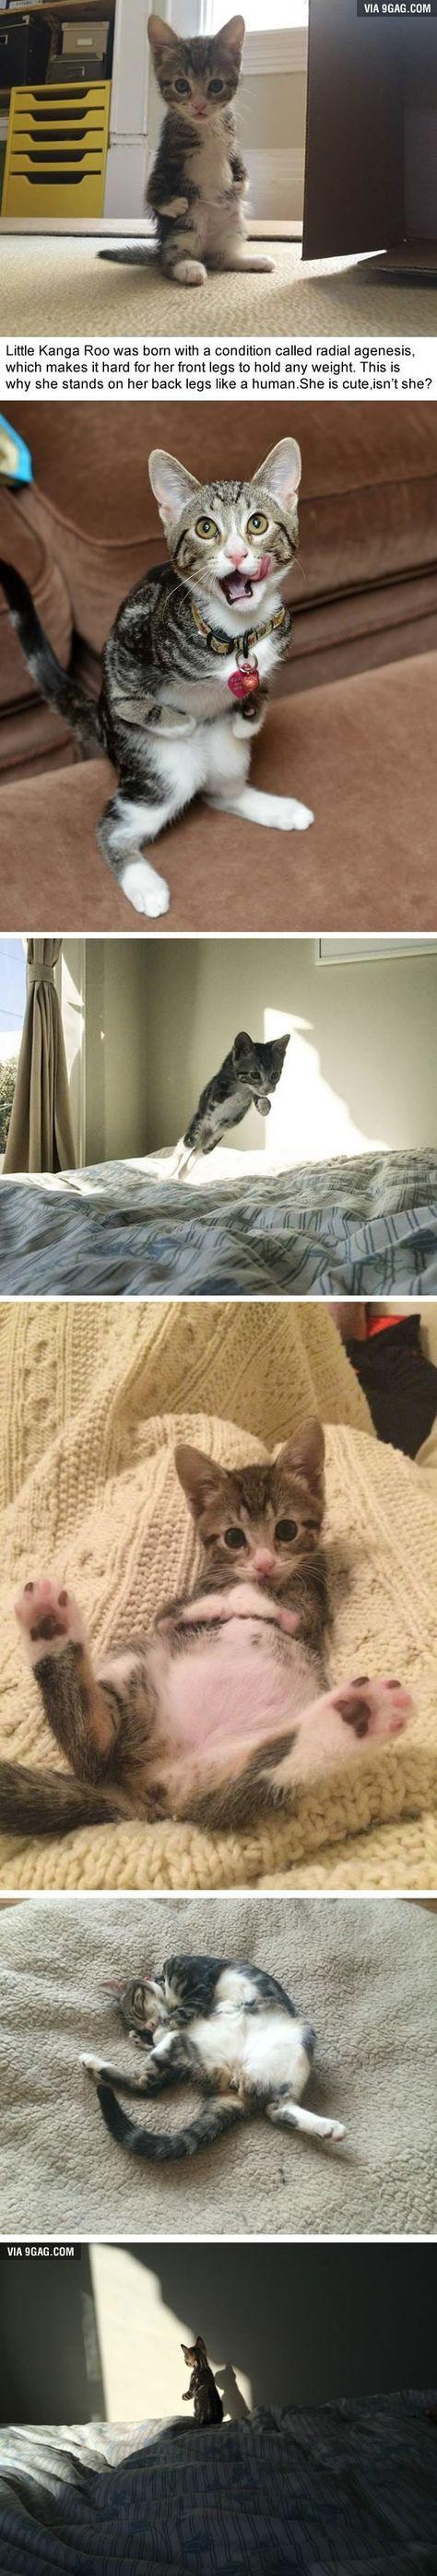 Little Kanga Roo cute animals cat cats adorable animal kittens pets kitten funny…